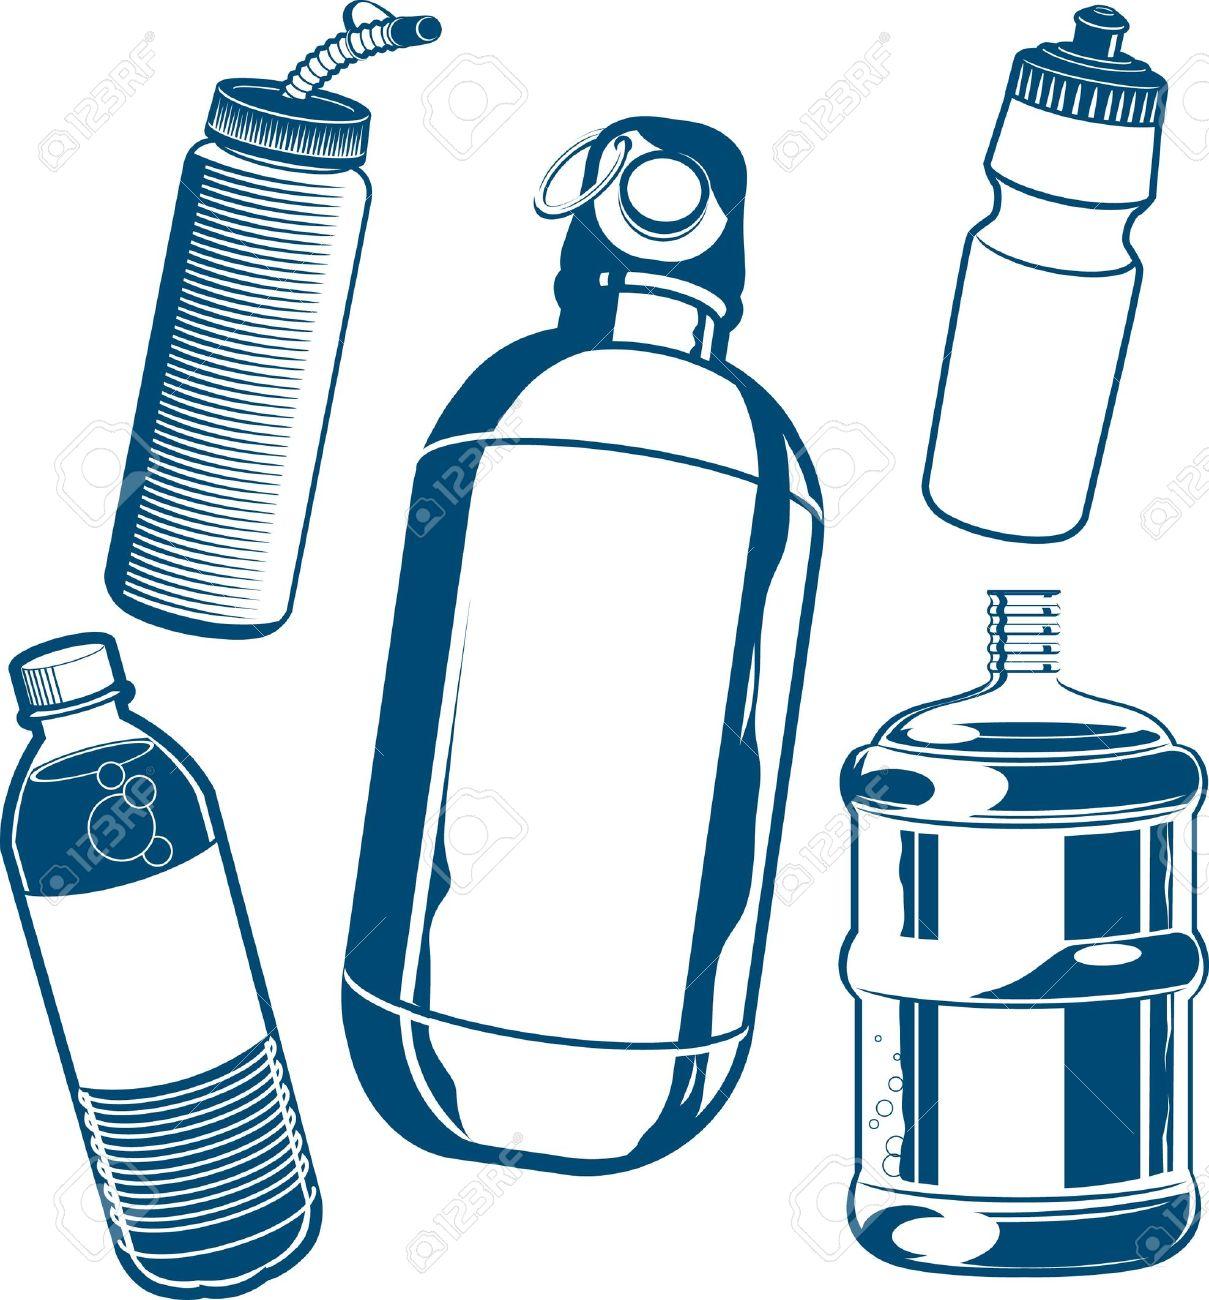 1209x1300 Bottle Clipart Plastic Bottle